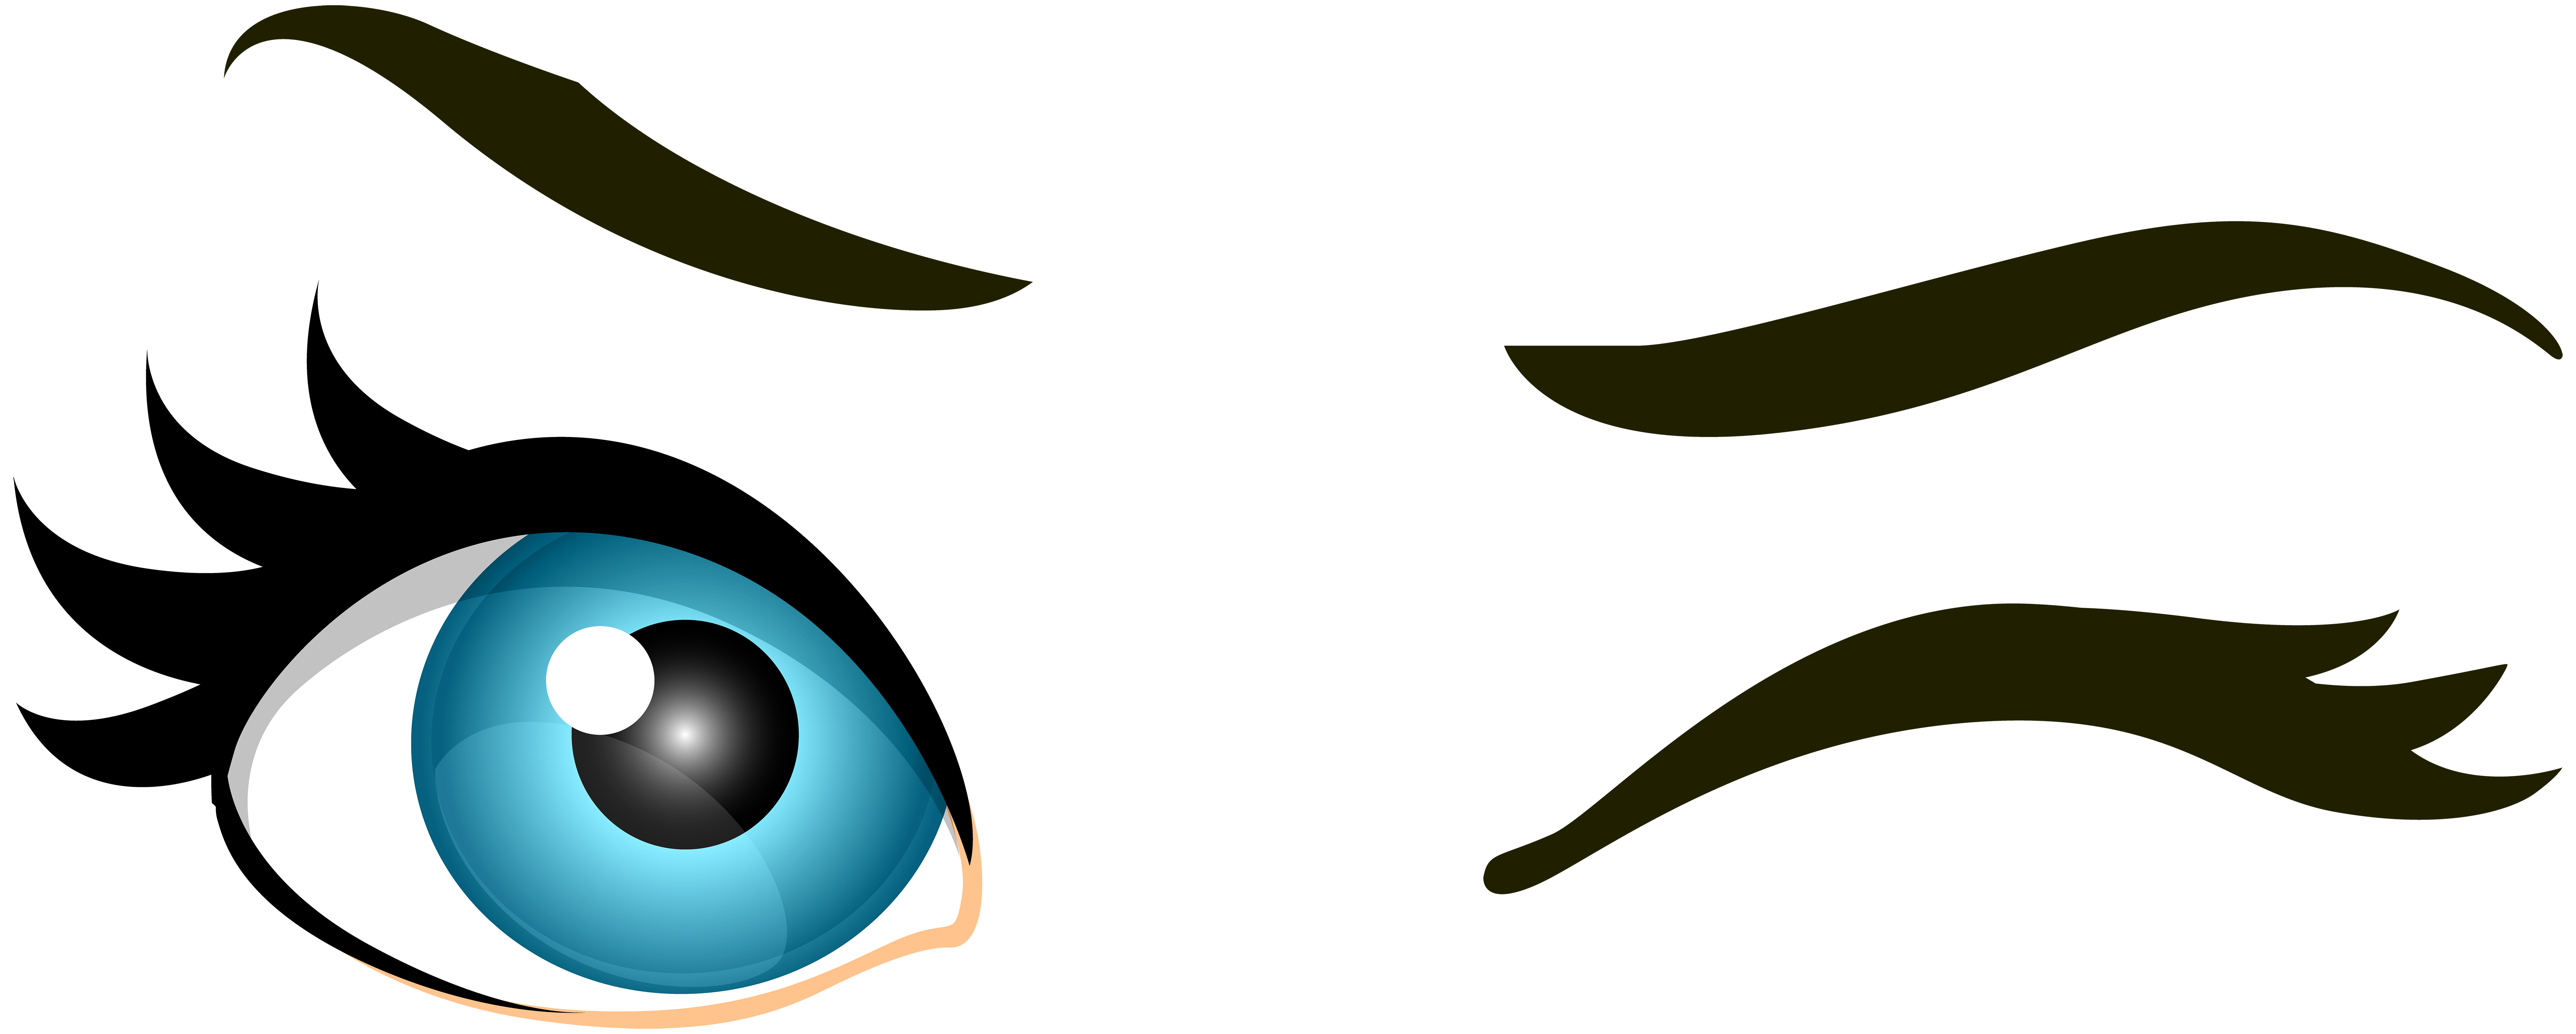 7000x2809 Blue Winking Eyes Png Clip Art